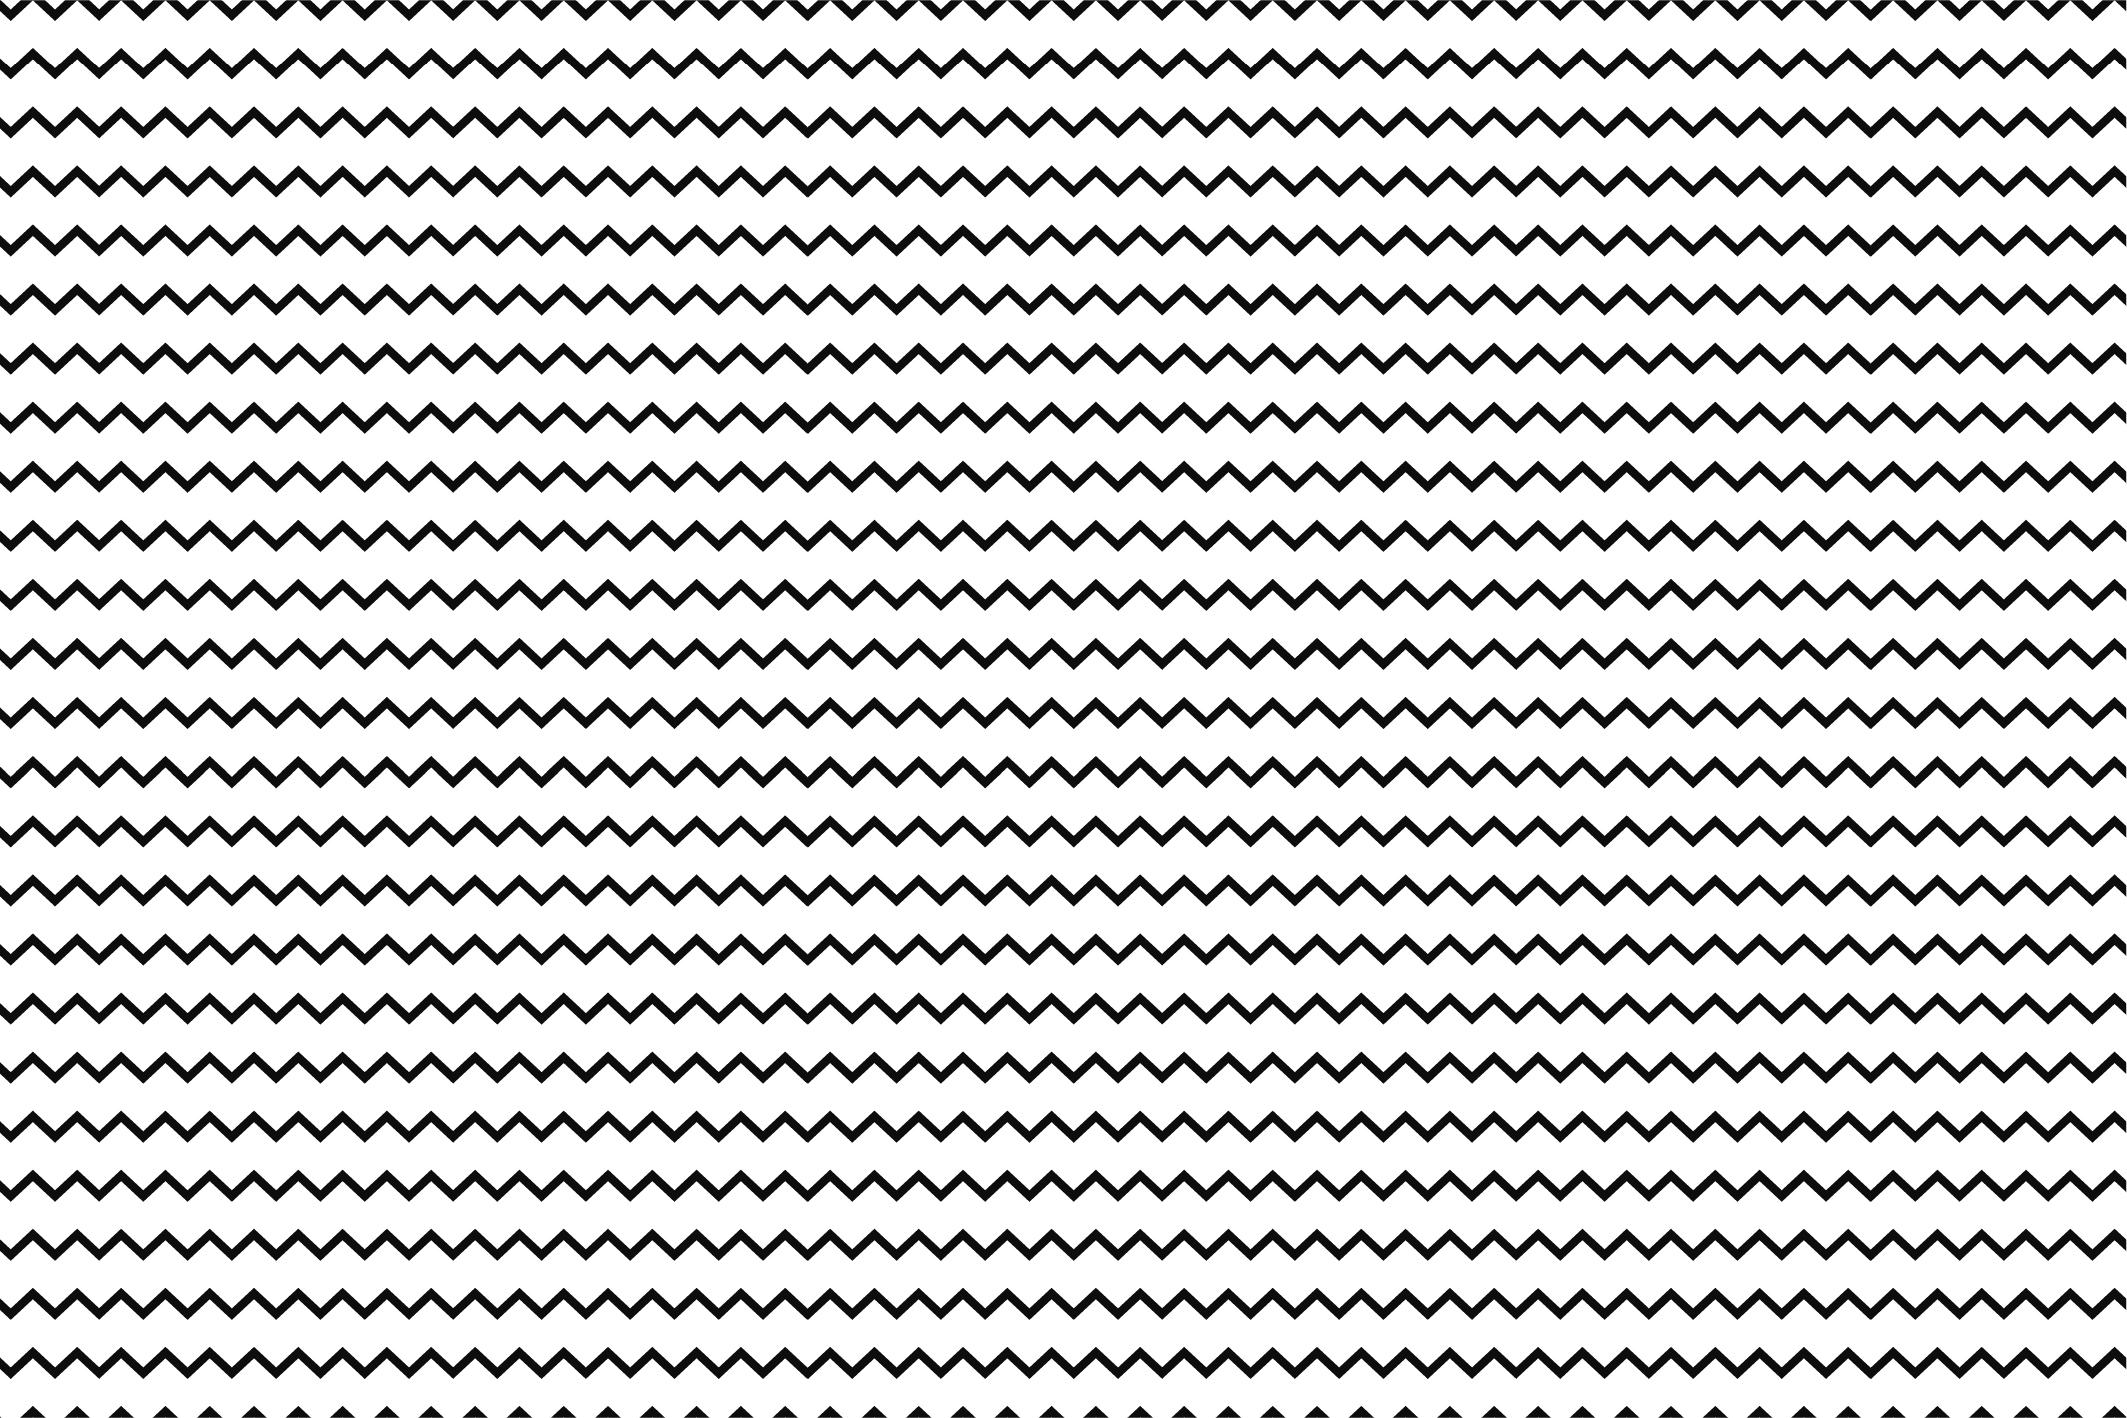 Wave&Zigzag seamless patterns. B&W. example image 11